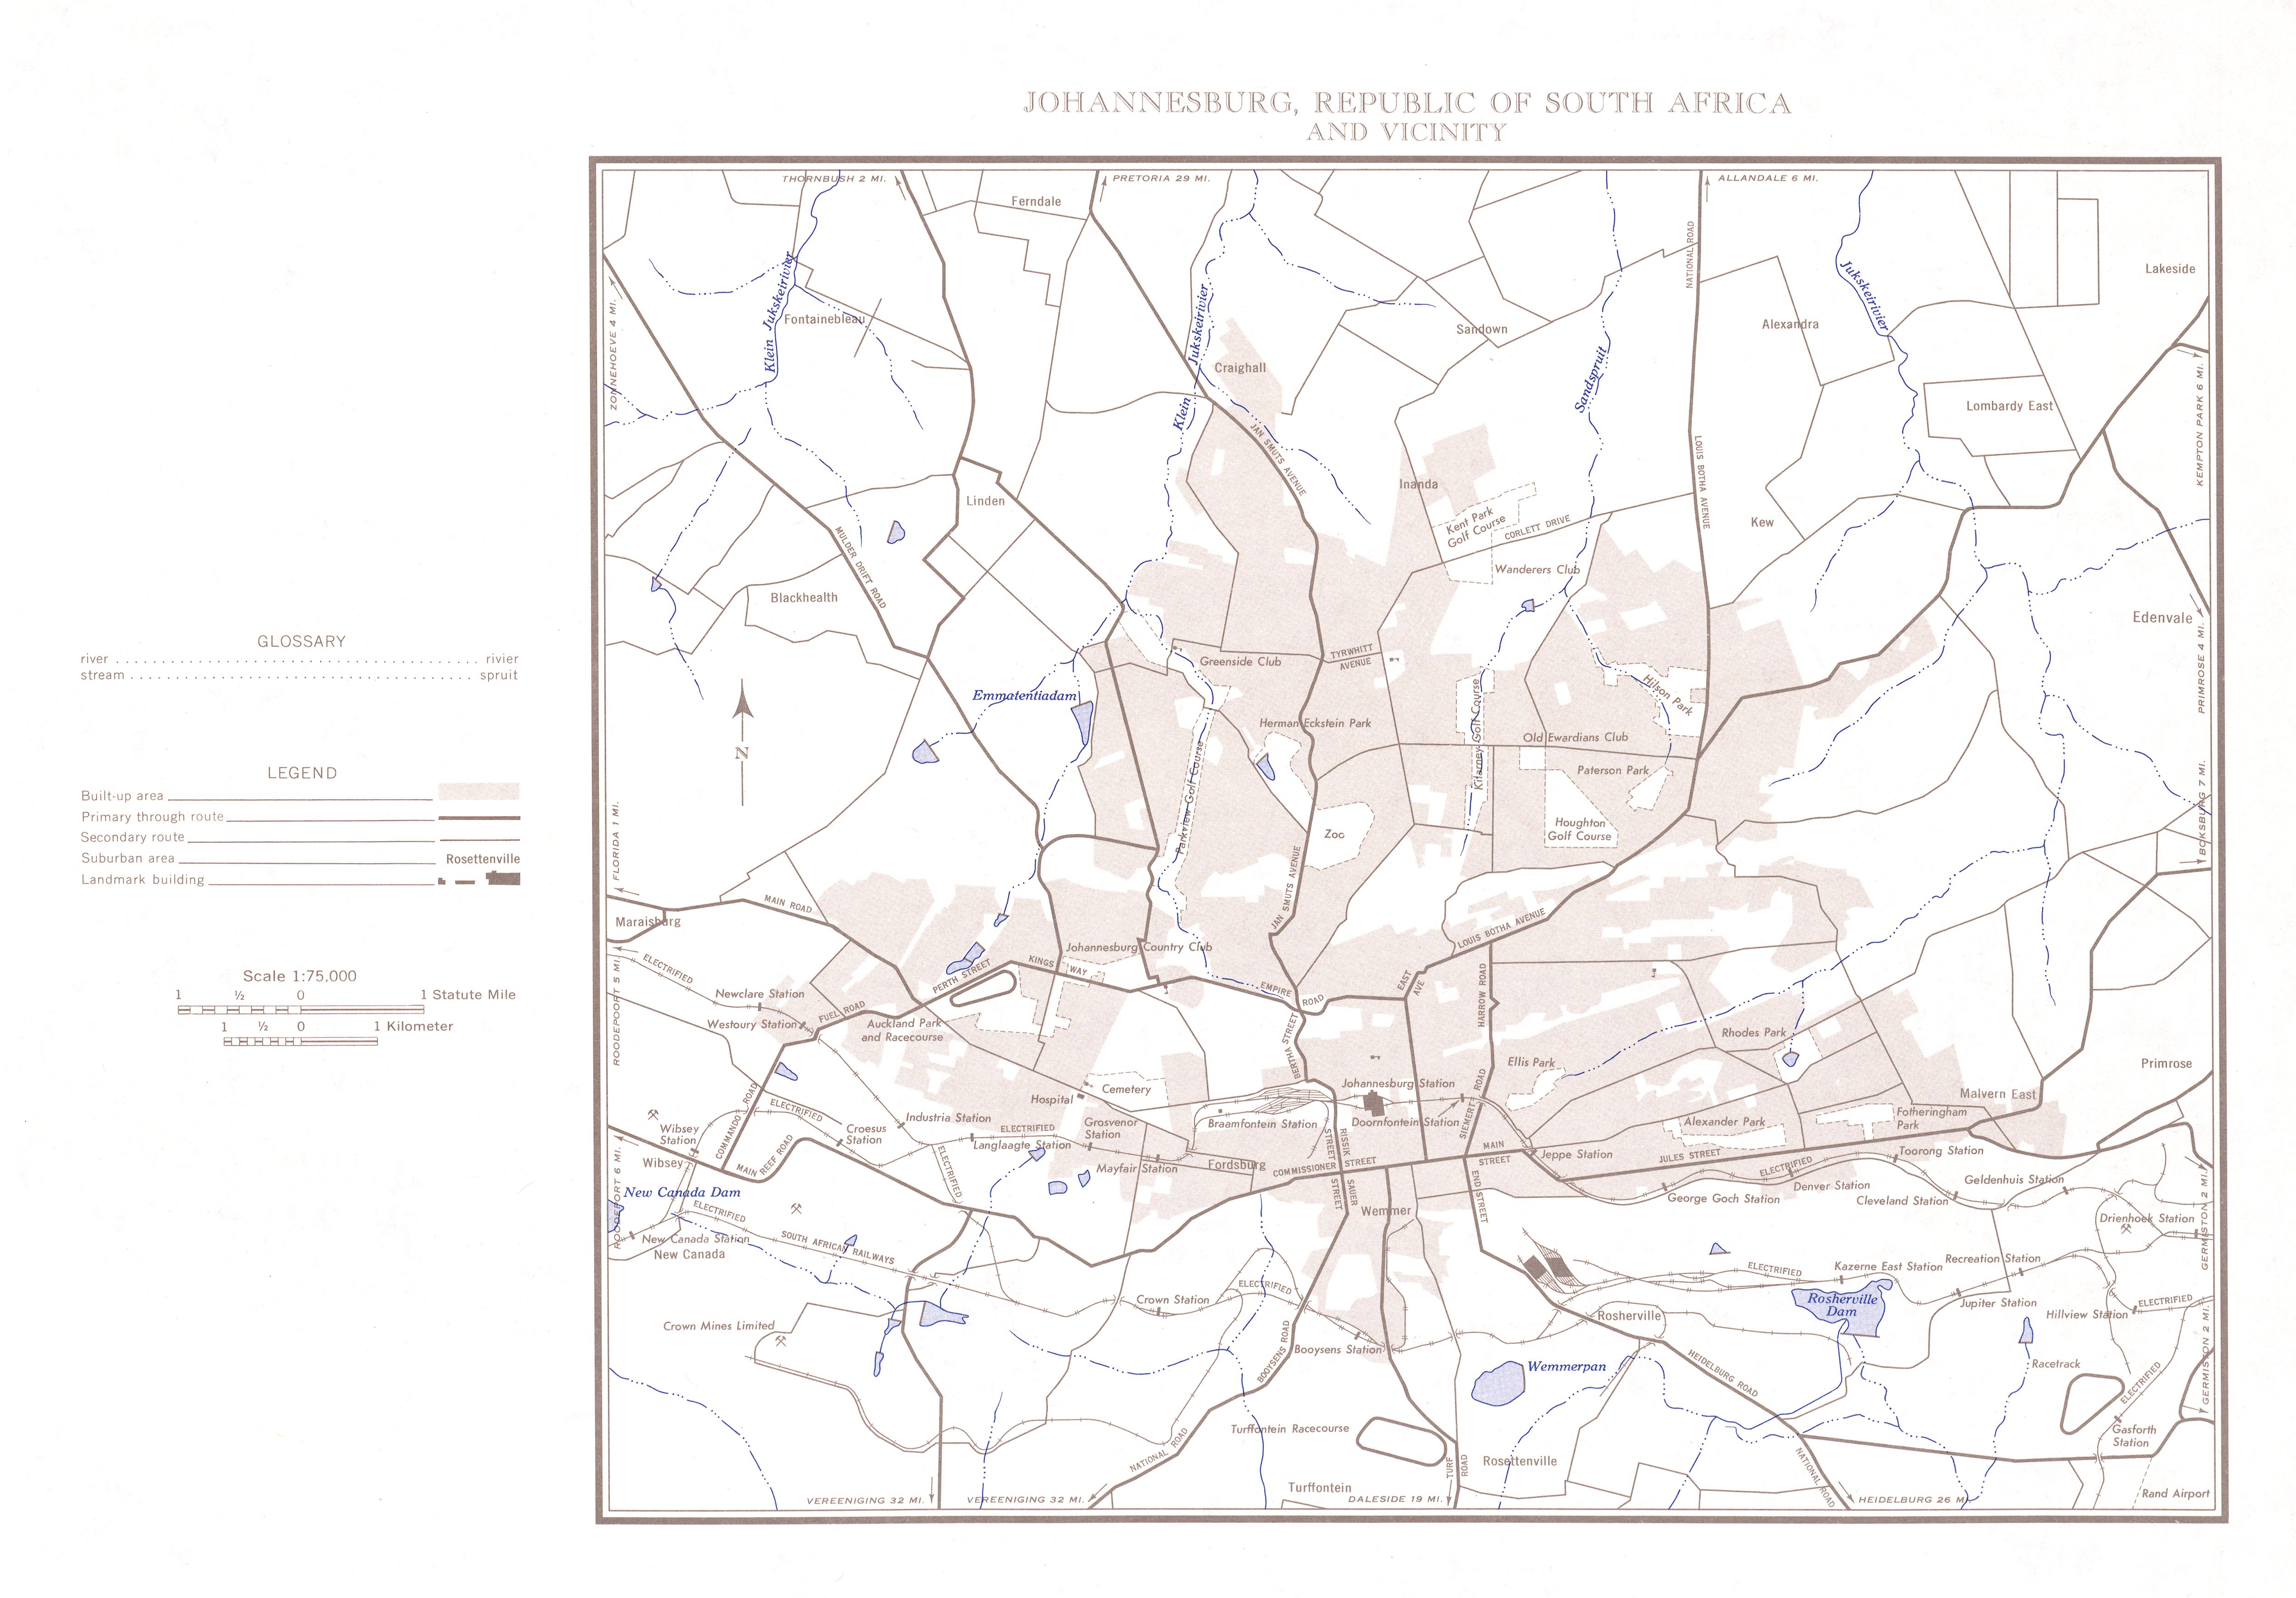 Mapa de Johannesburgo y Cercanías, Sudáfrica 1954